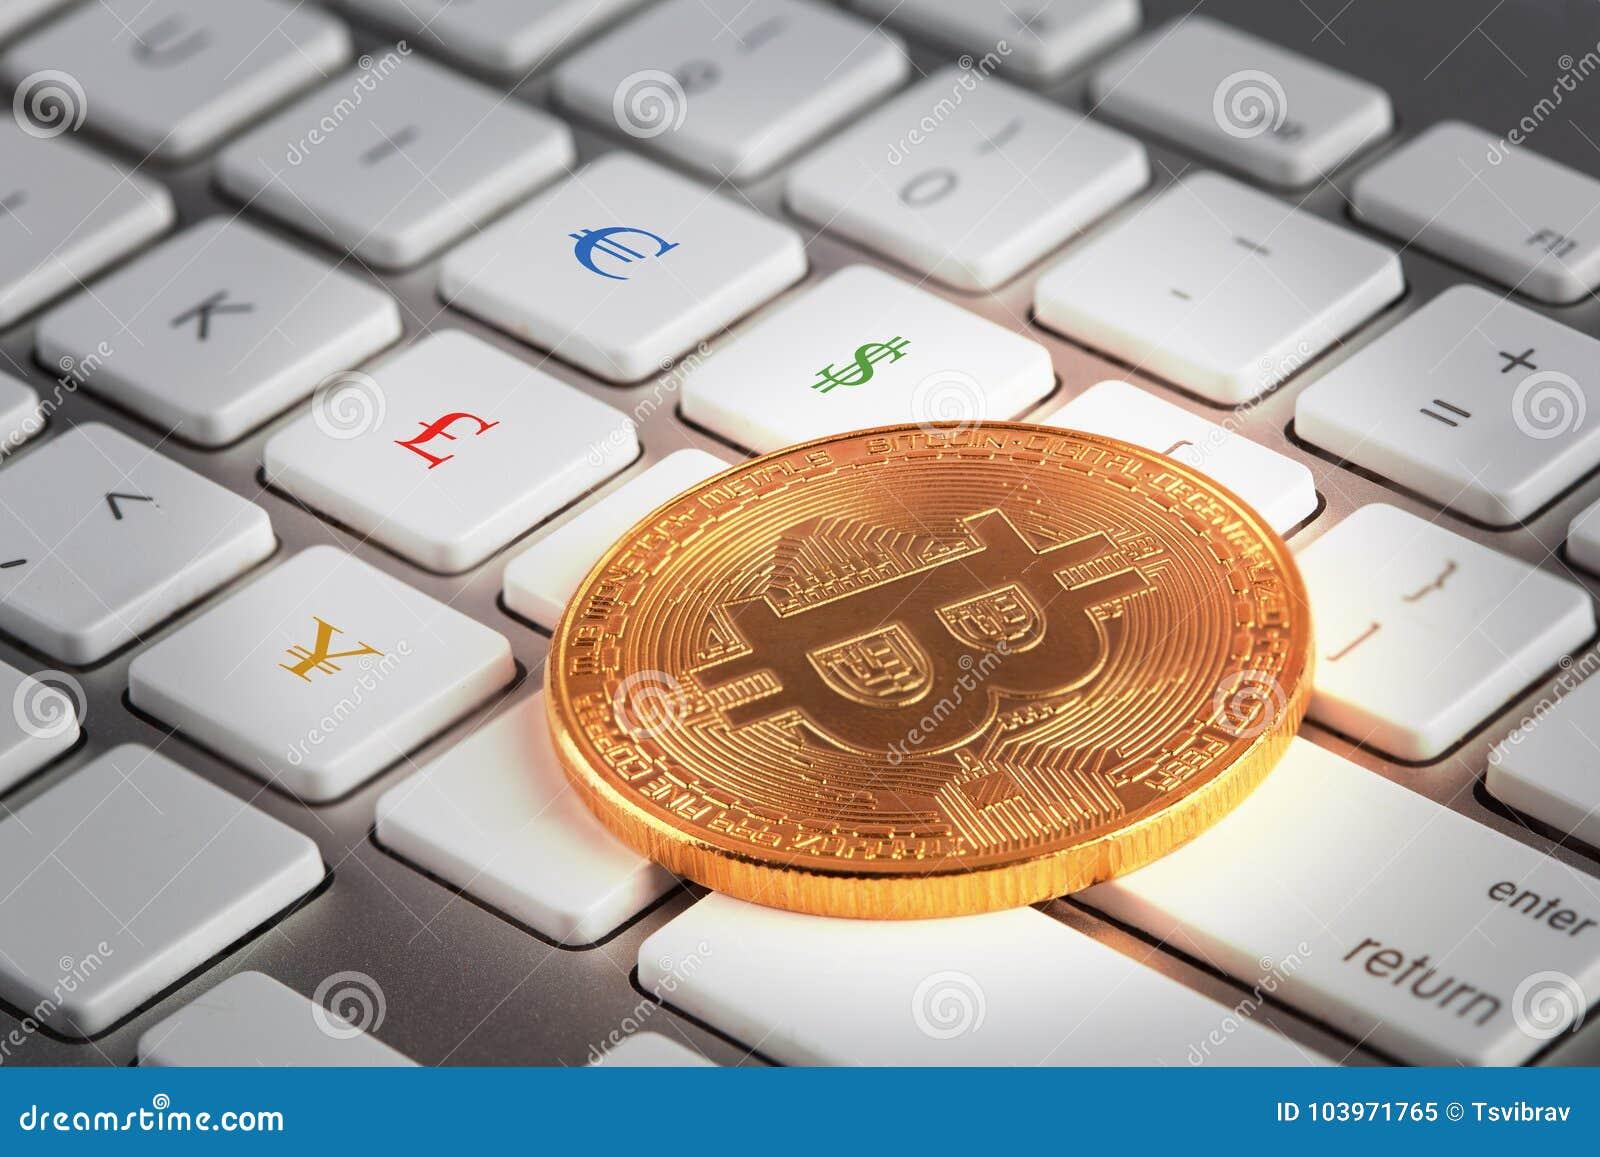 Golden Bitcoin On White Keyboard With Euro Dollar Pound And Yen